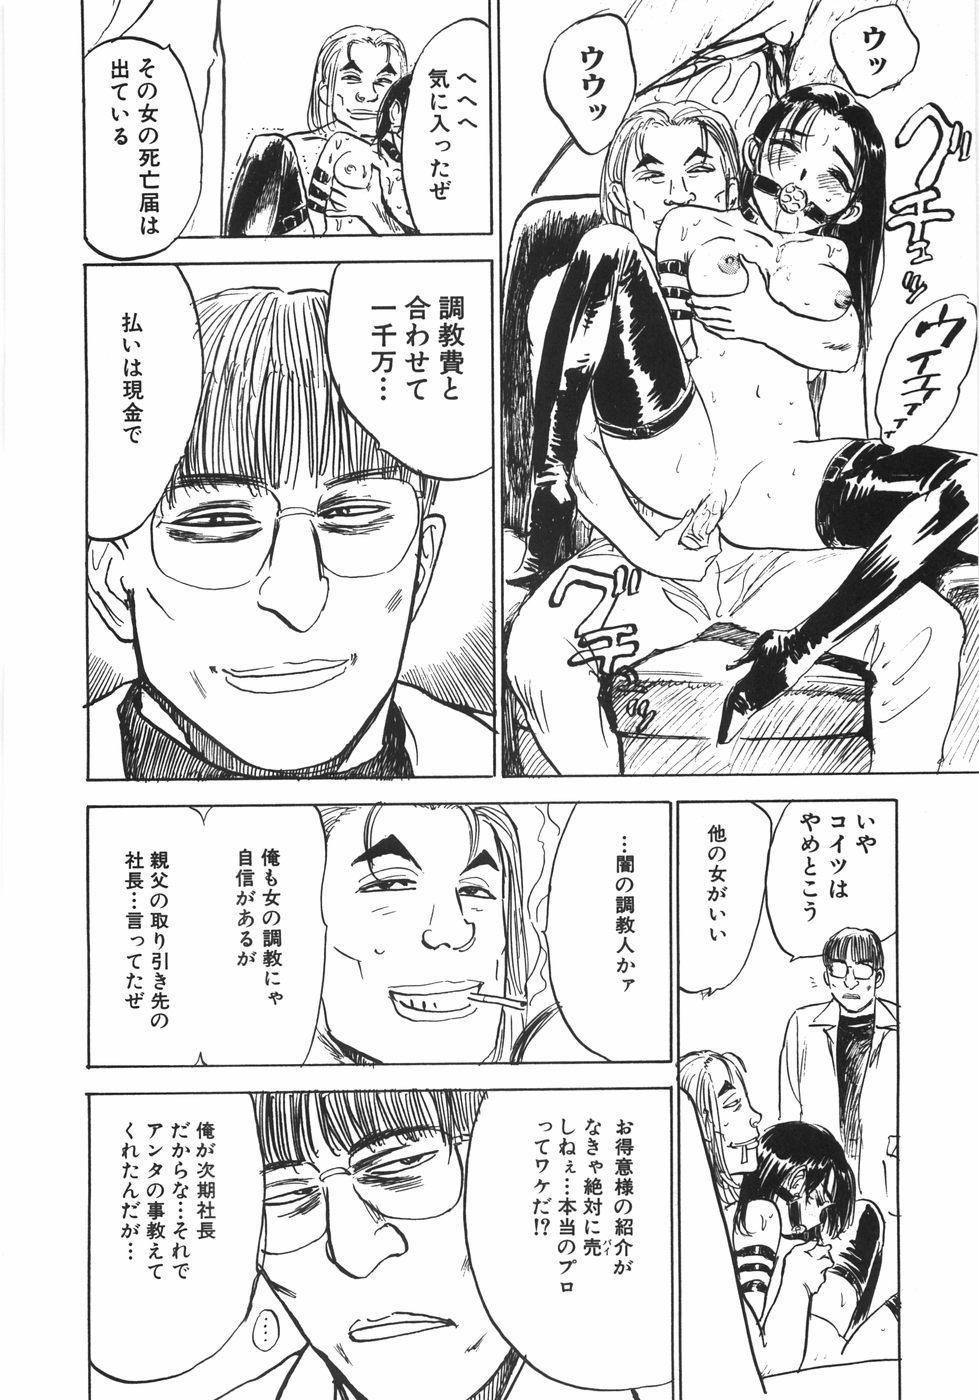 Ningyou no Yakata - The Doll House 90